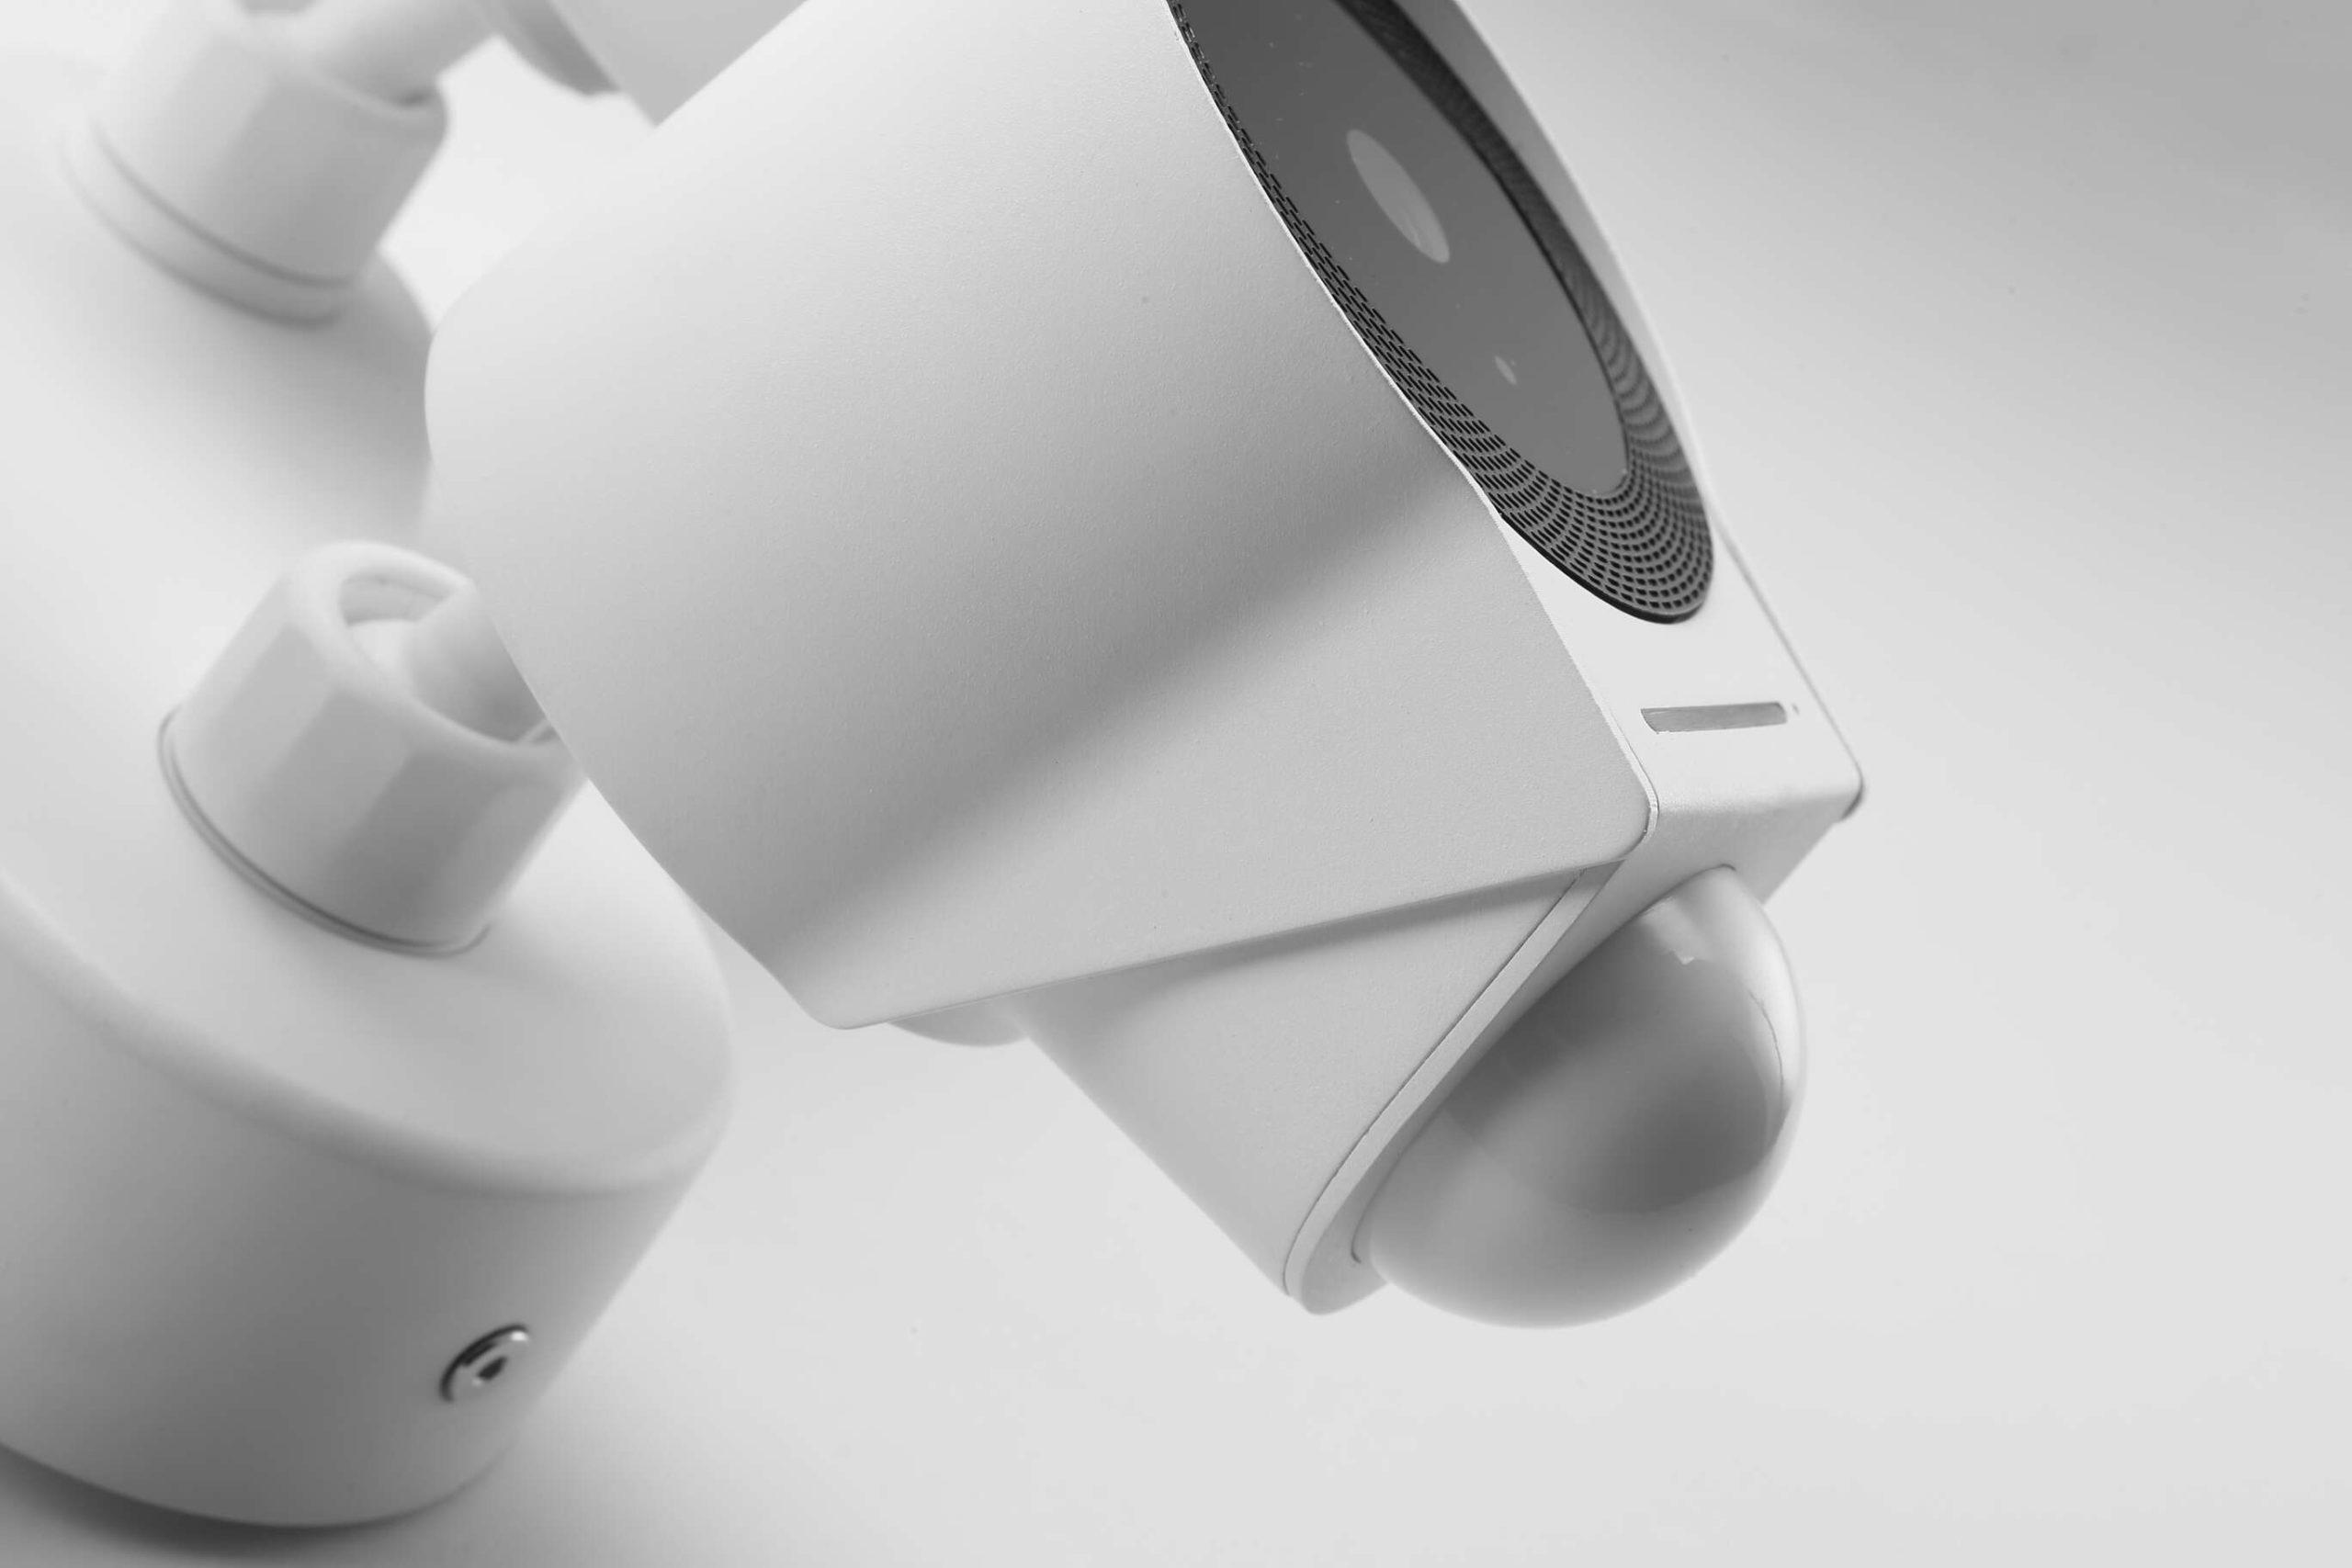 HEIMDALL Outdoor Security Camera by ALOS. Product Design Studio.